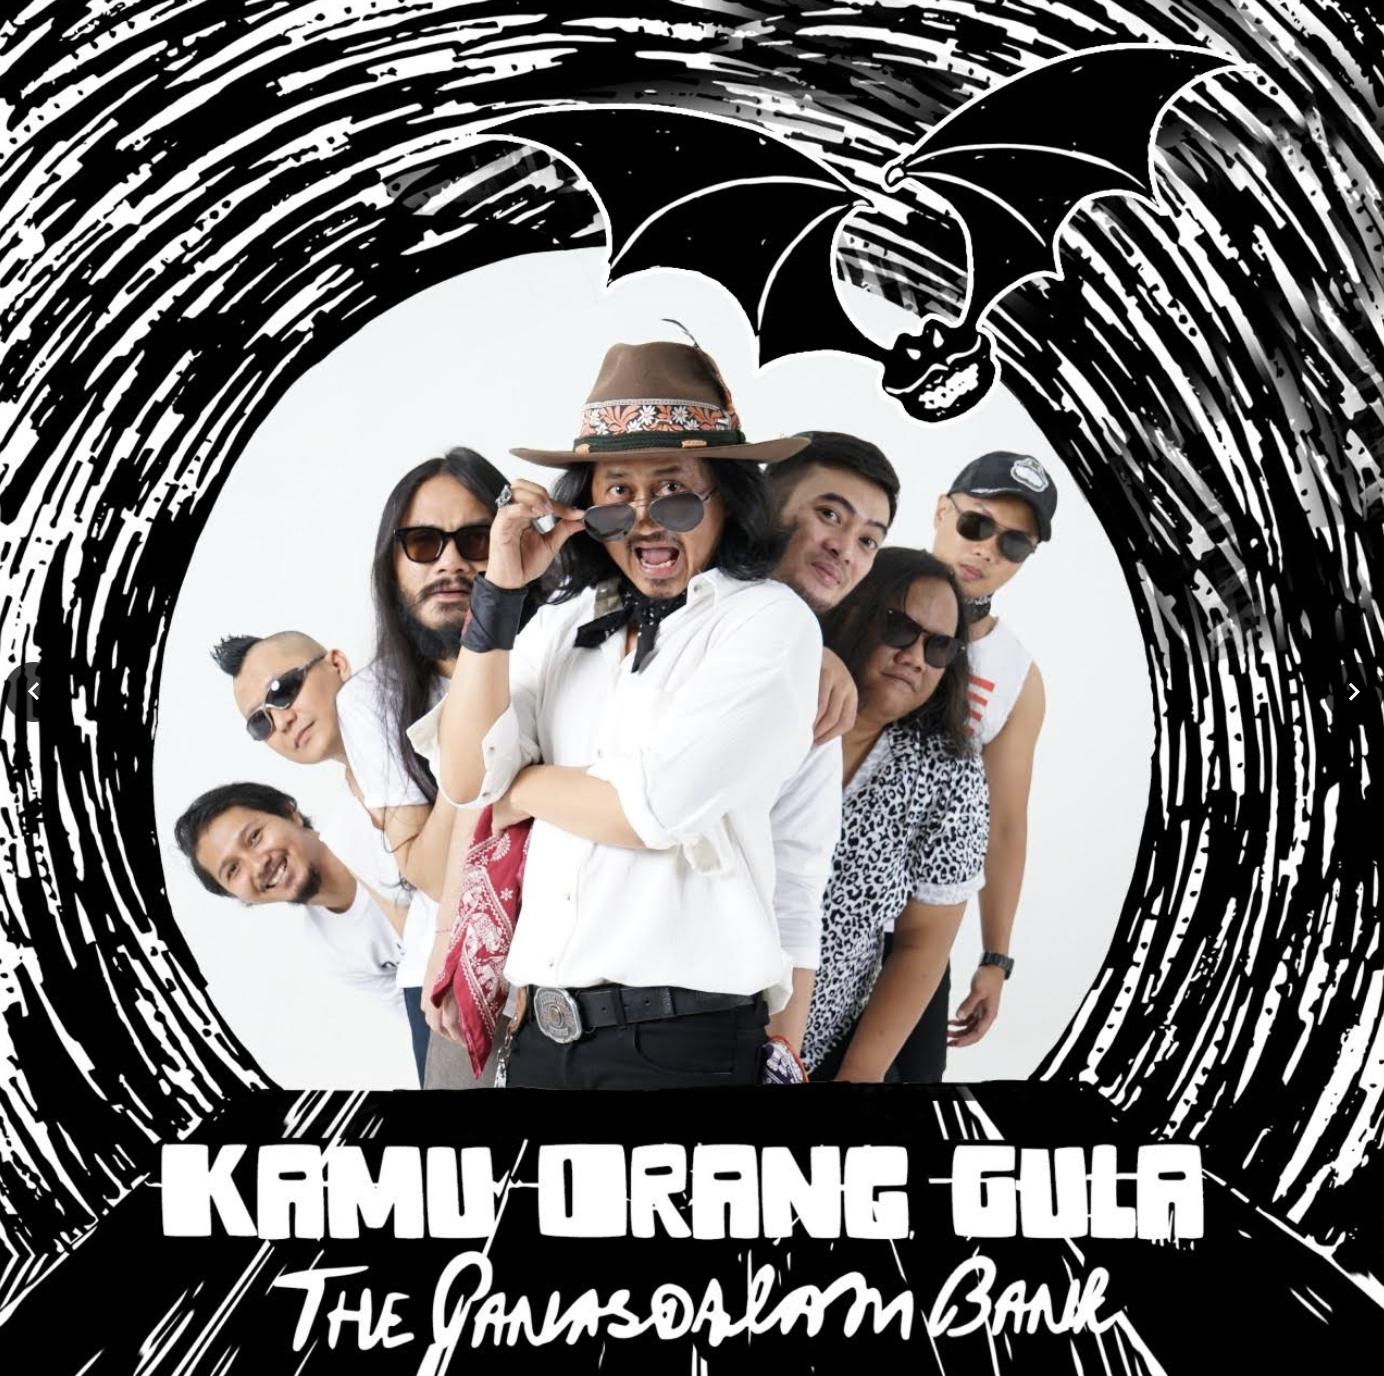 "The Panasdalam Bank Rilis ""Kamu Orang Gula"", Single Dari EP Terbaru!"